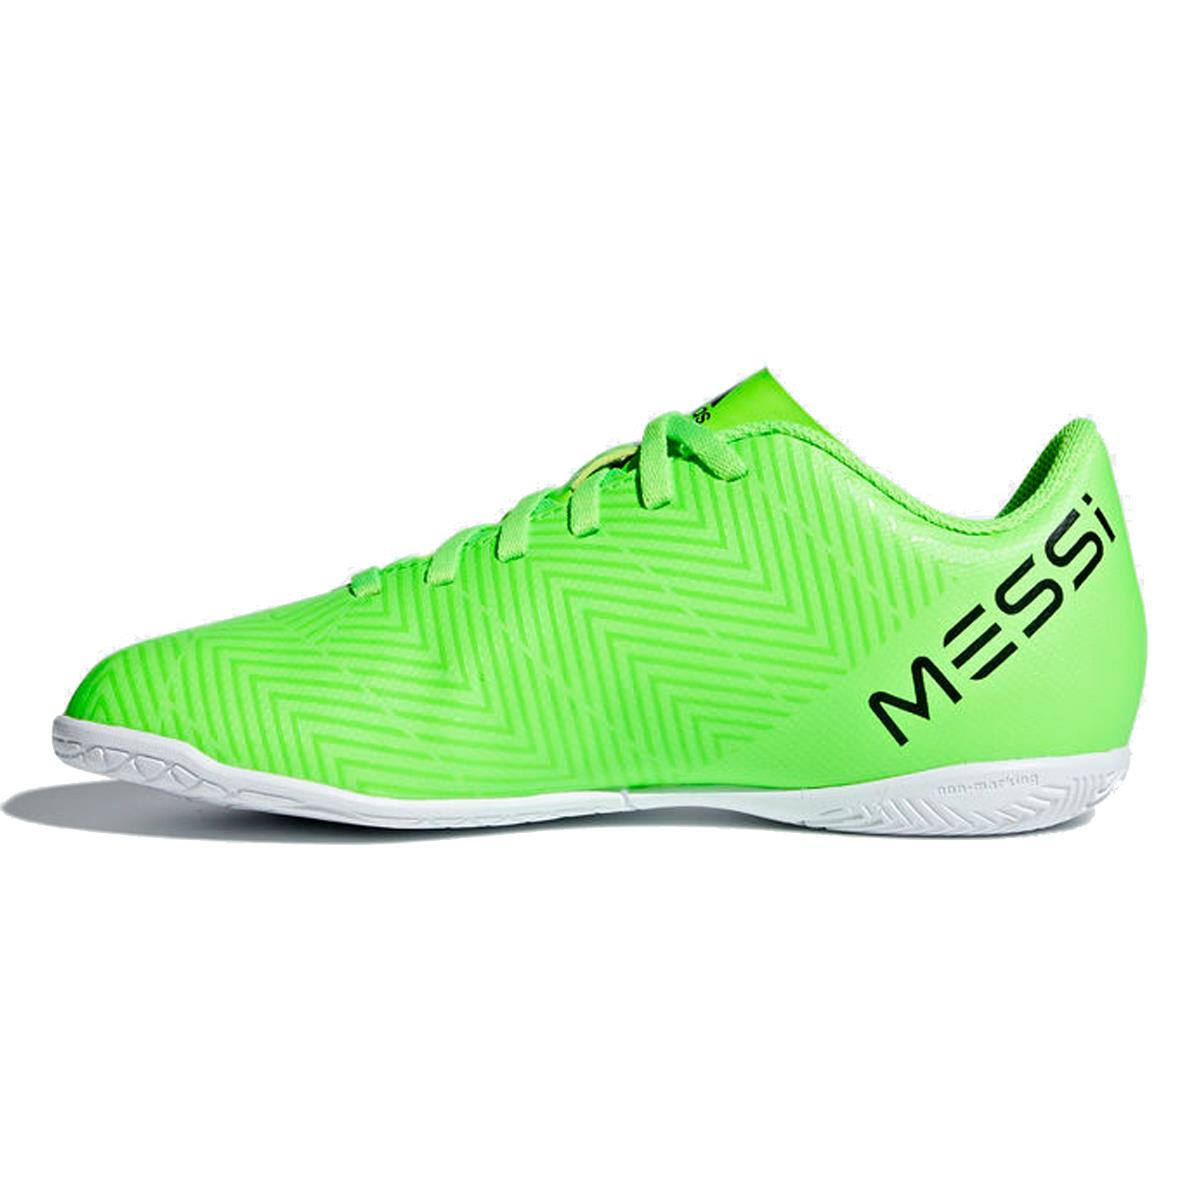 5cfcd4b49b Chuteira Futsal Adidas Nemeziz Messi Tango 18.4 Infantil Verde Limão